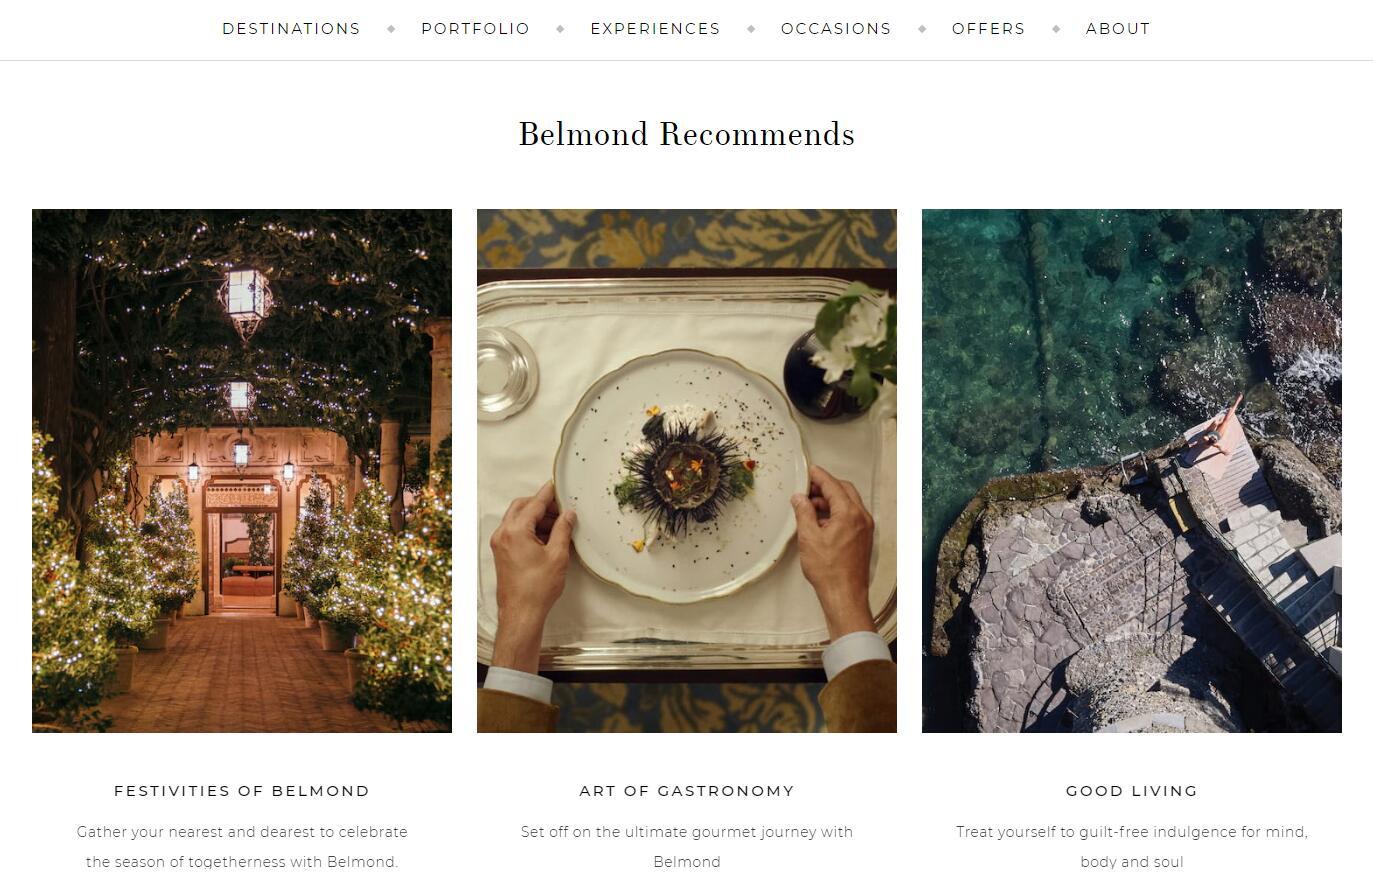 LVMH 解读旗下奢华酒店和旅行集团  Belmond 的战略规划:重点扩大亚洲客户群